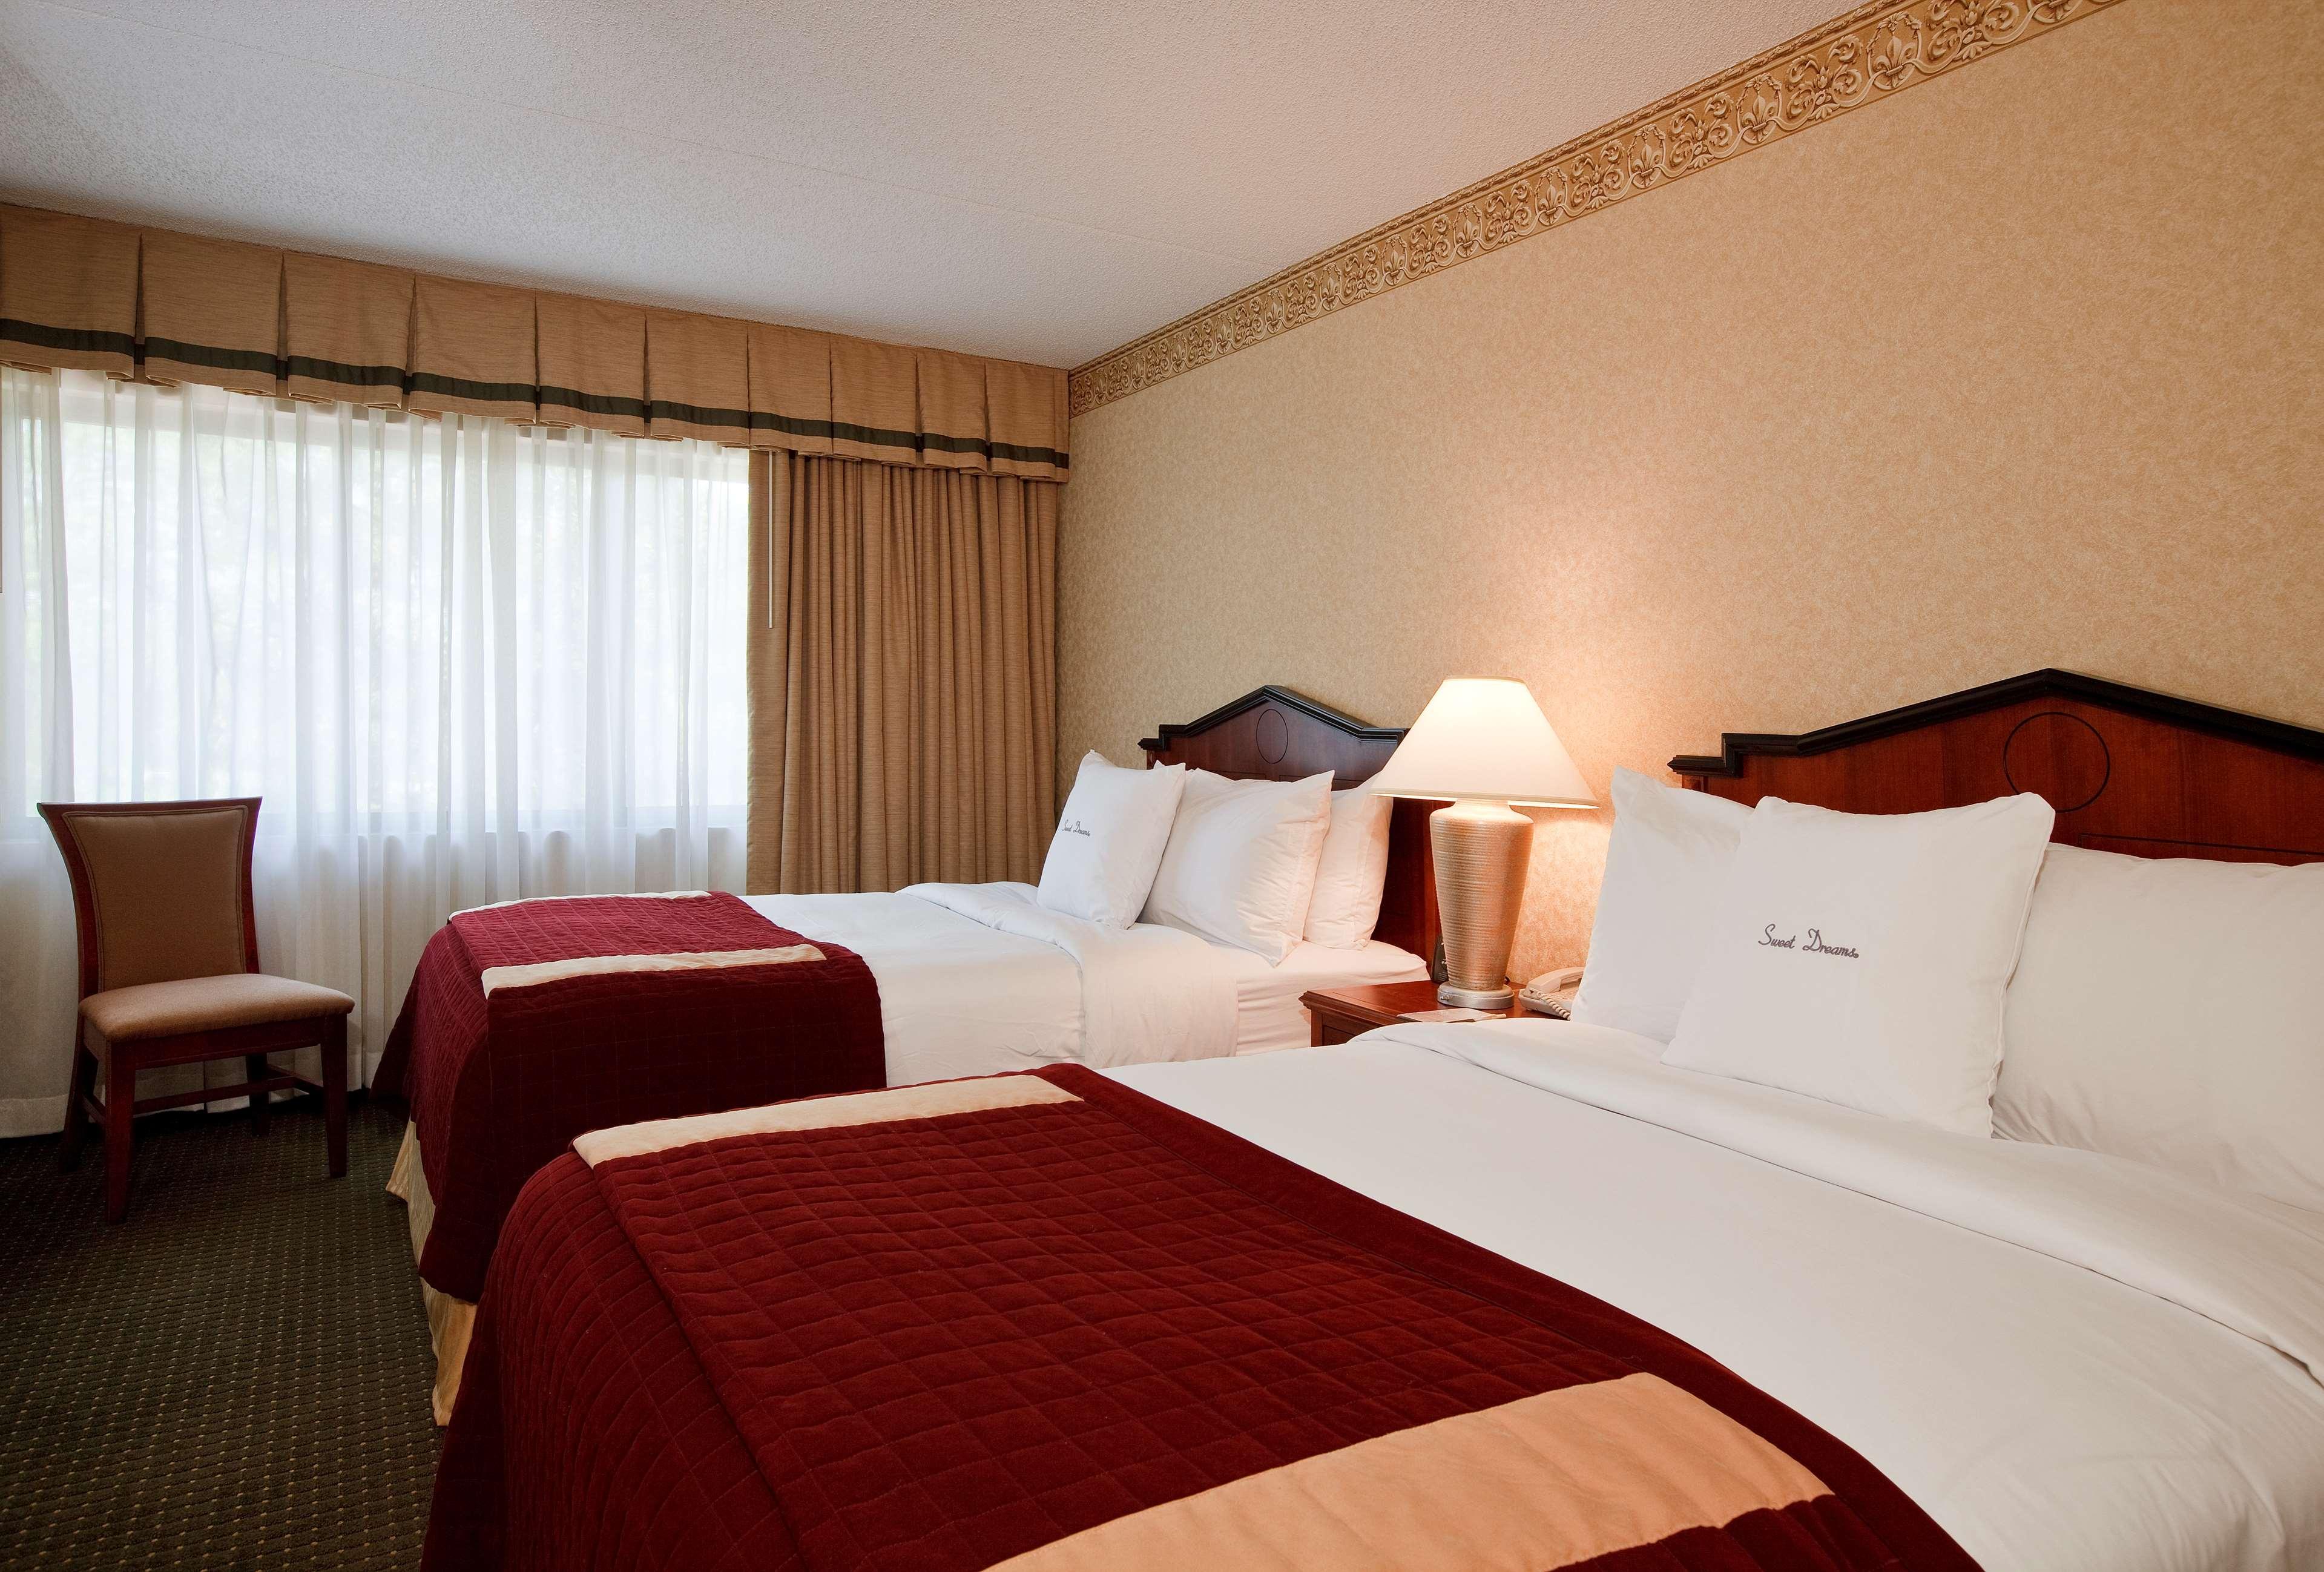 DoubleTree Suites by Hilton Hotel Cincinnati - Blue Ash image 10